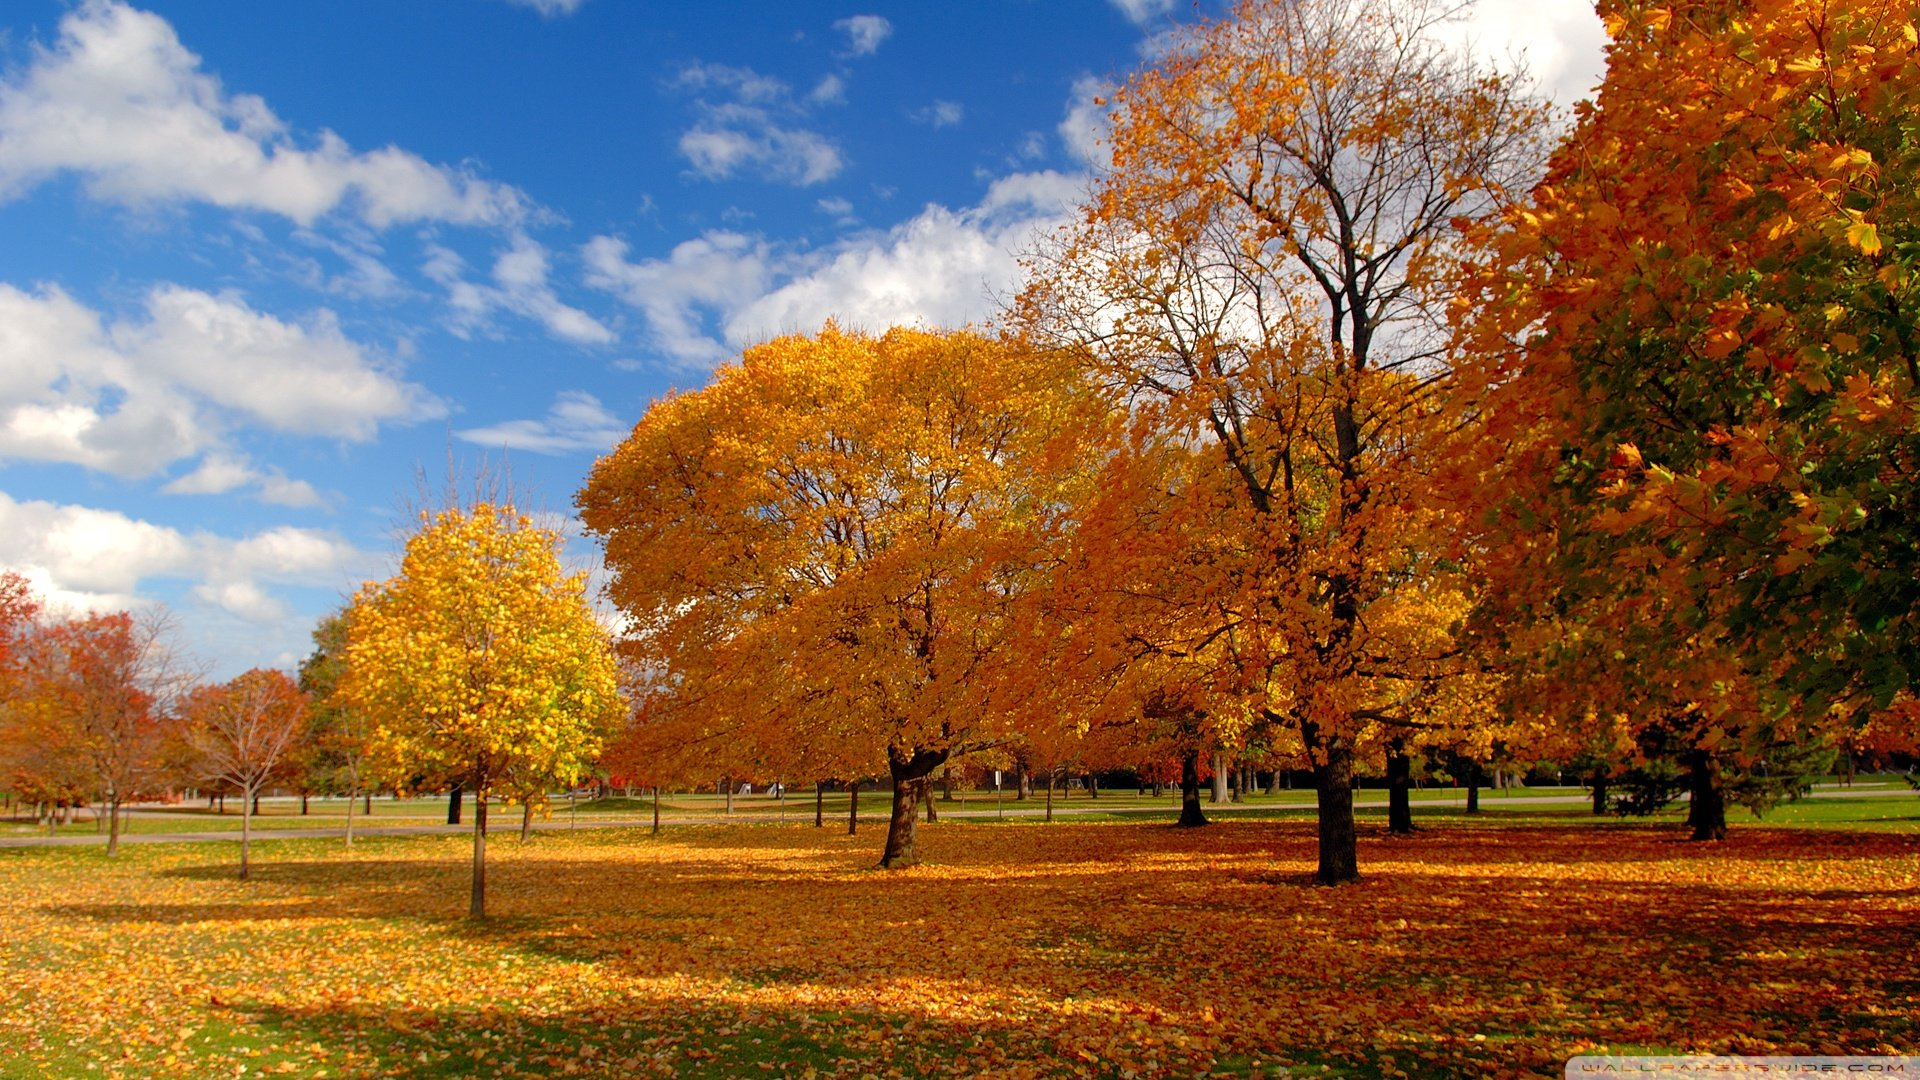 Autumn Park 757143 - WallDevil